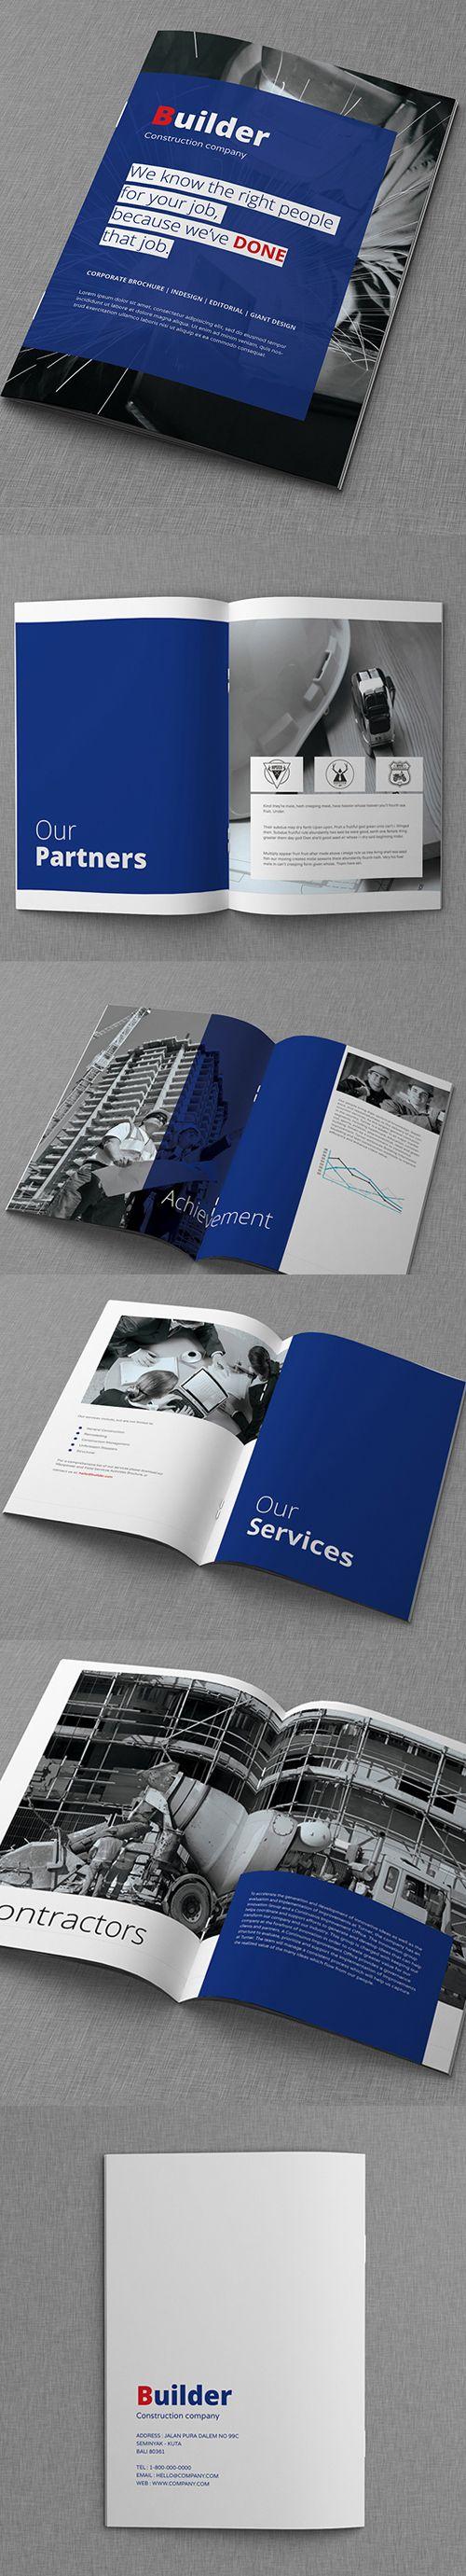 company profile brochure template - brochure template brochures and business brochure on